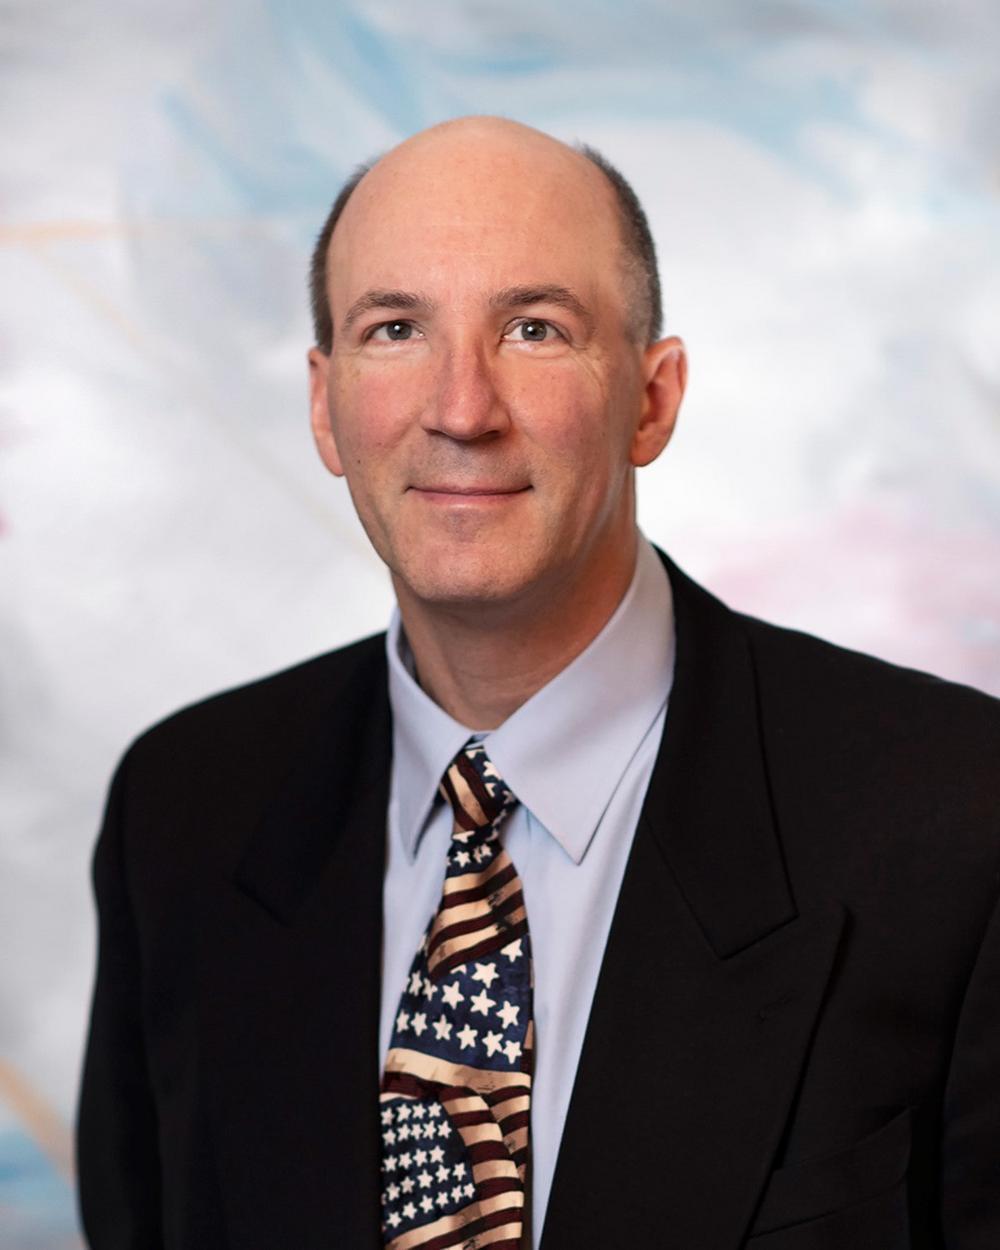 David W. Koler